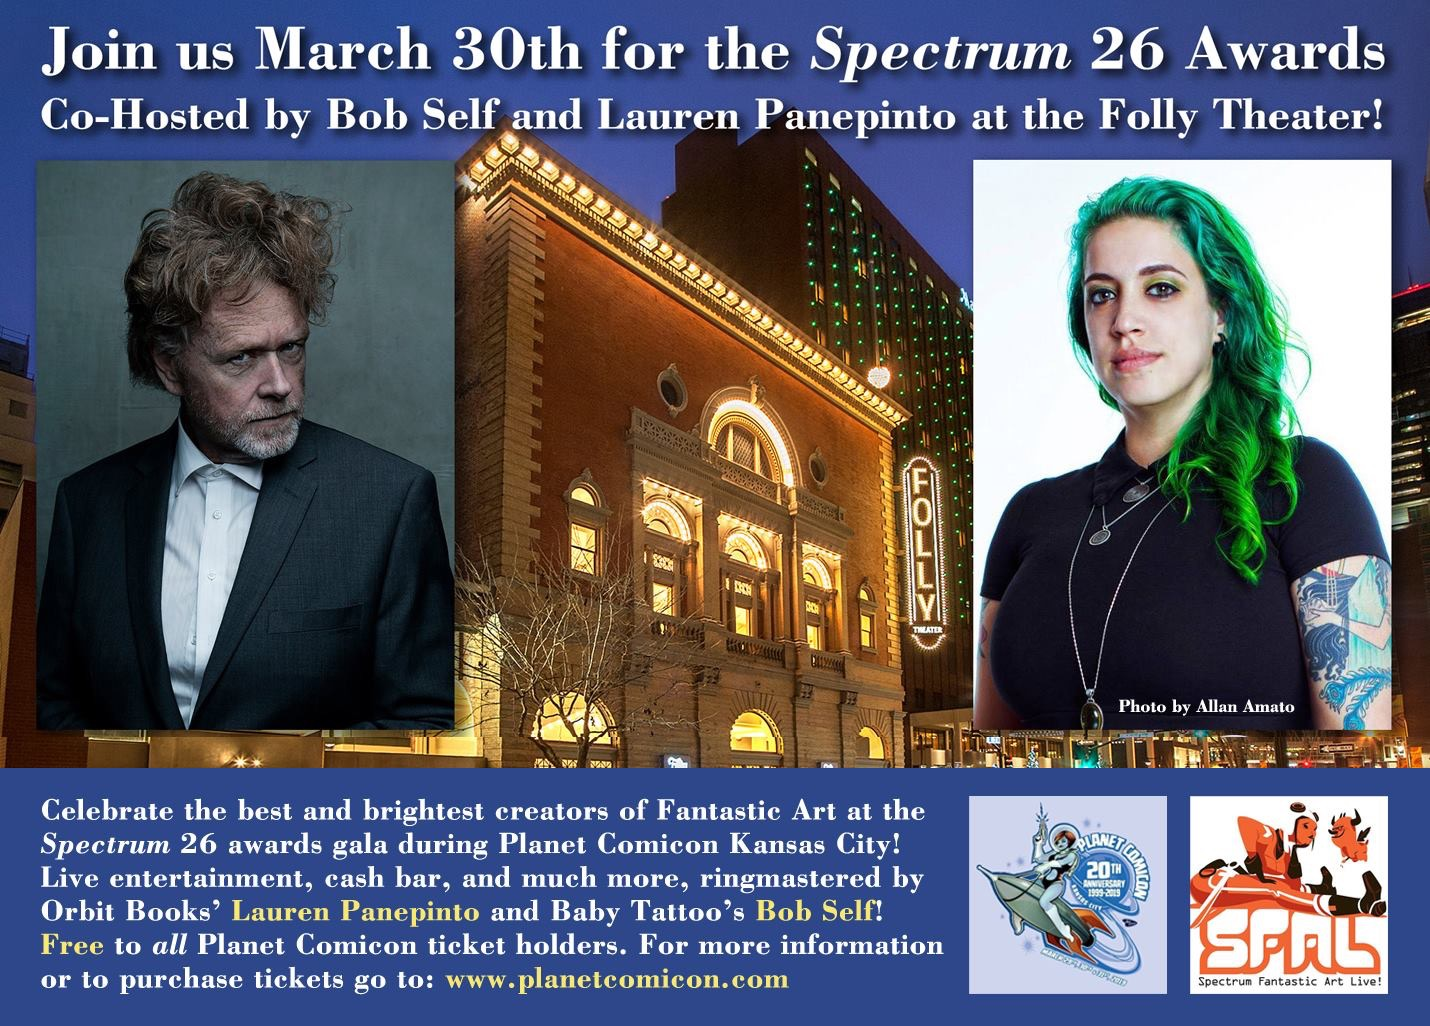 Spectrum 26 Awards